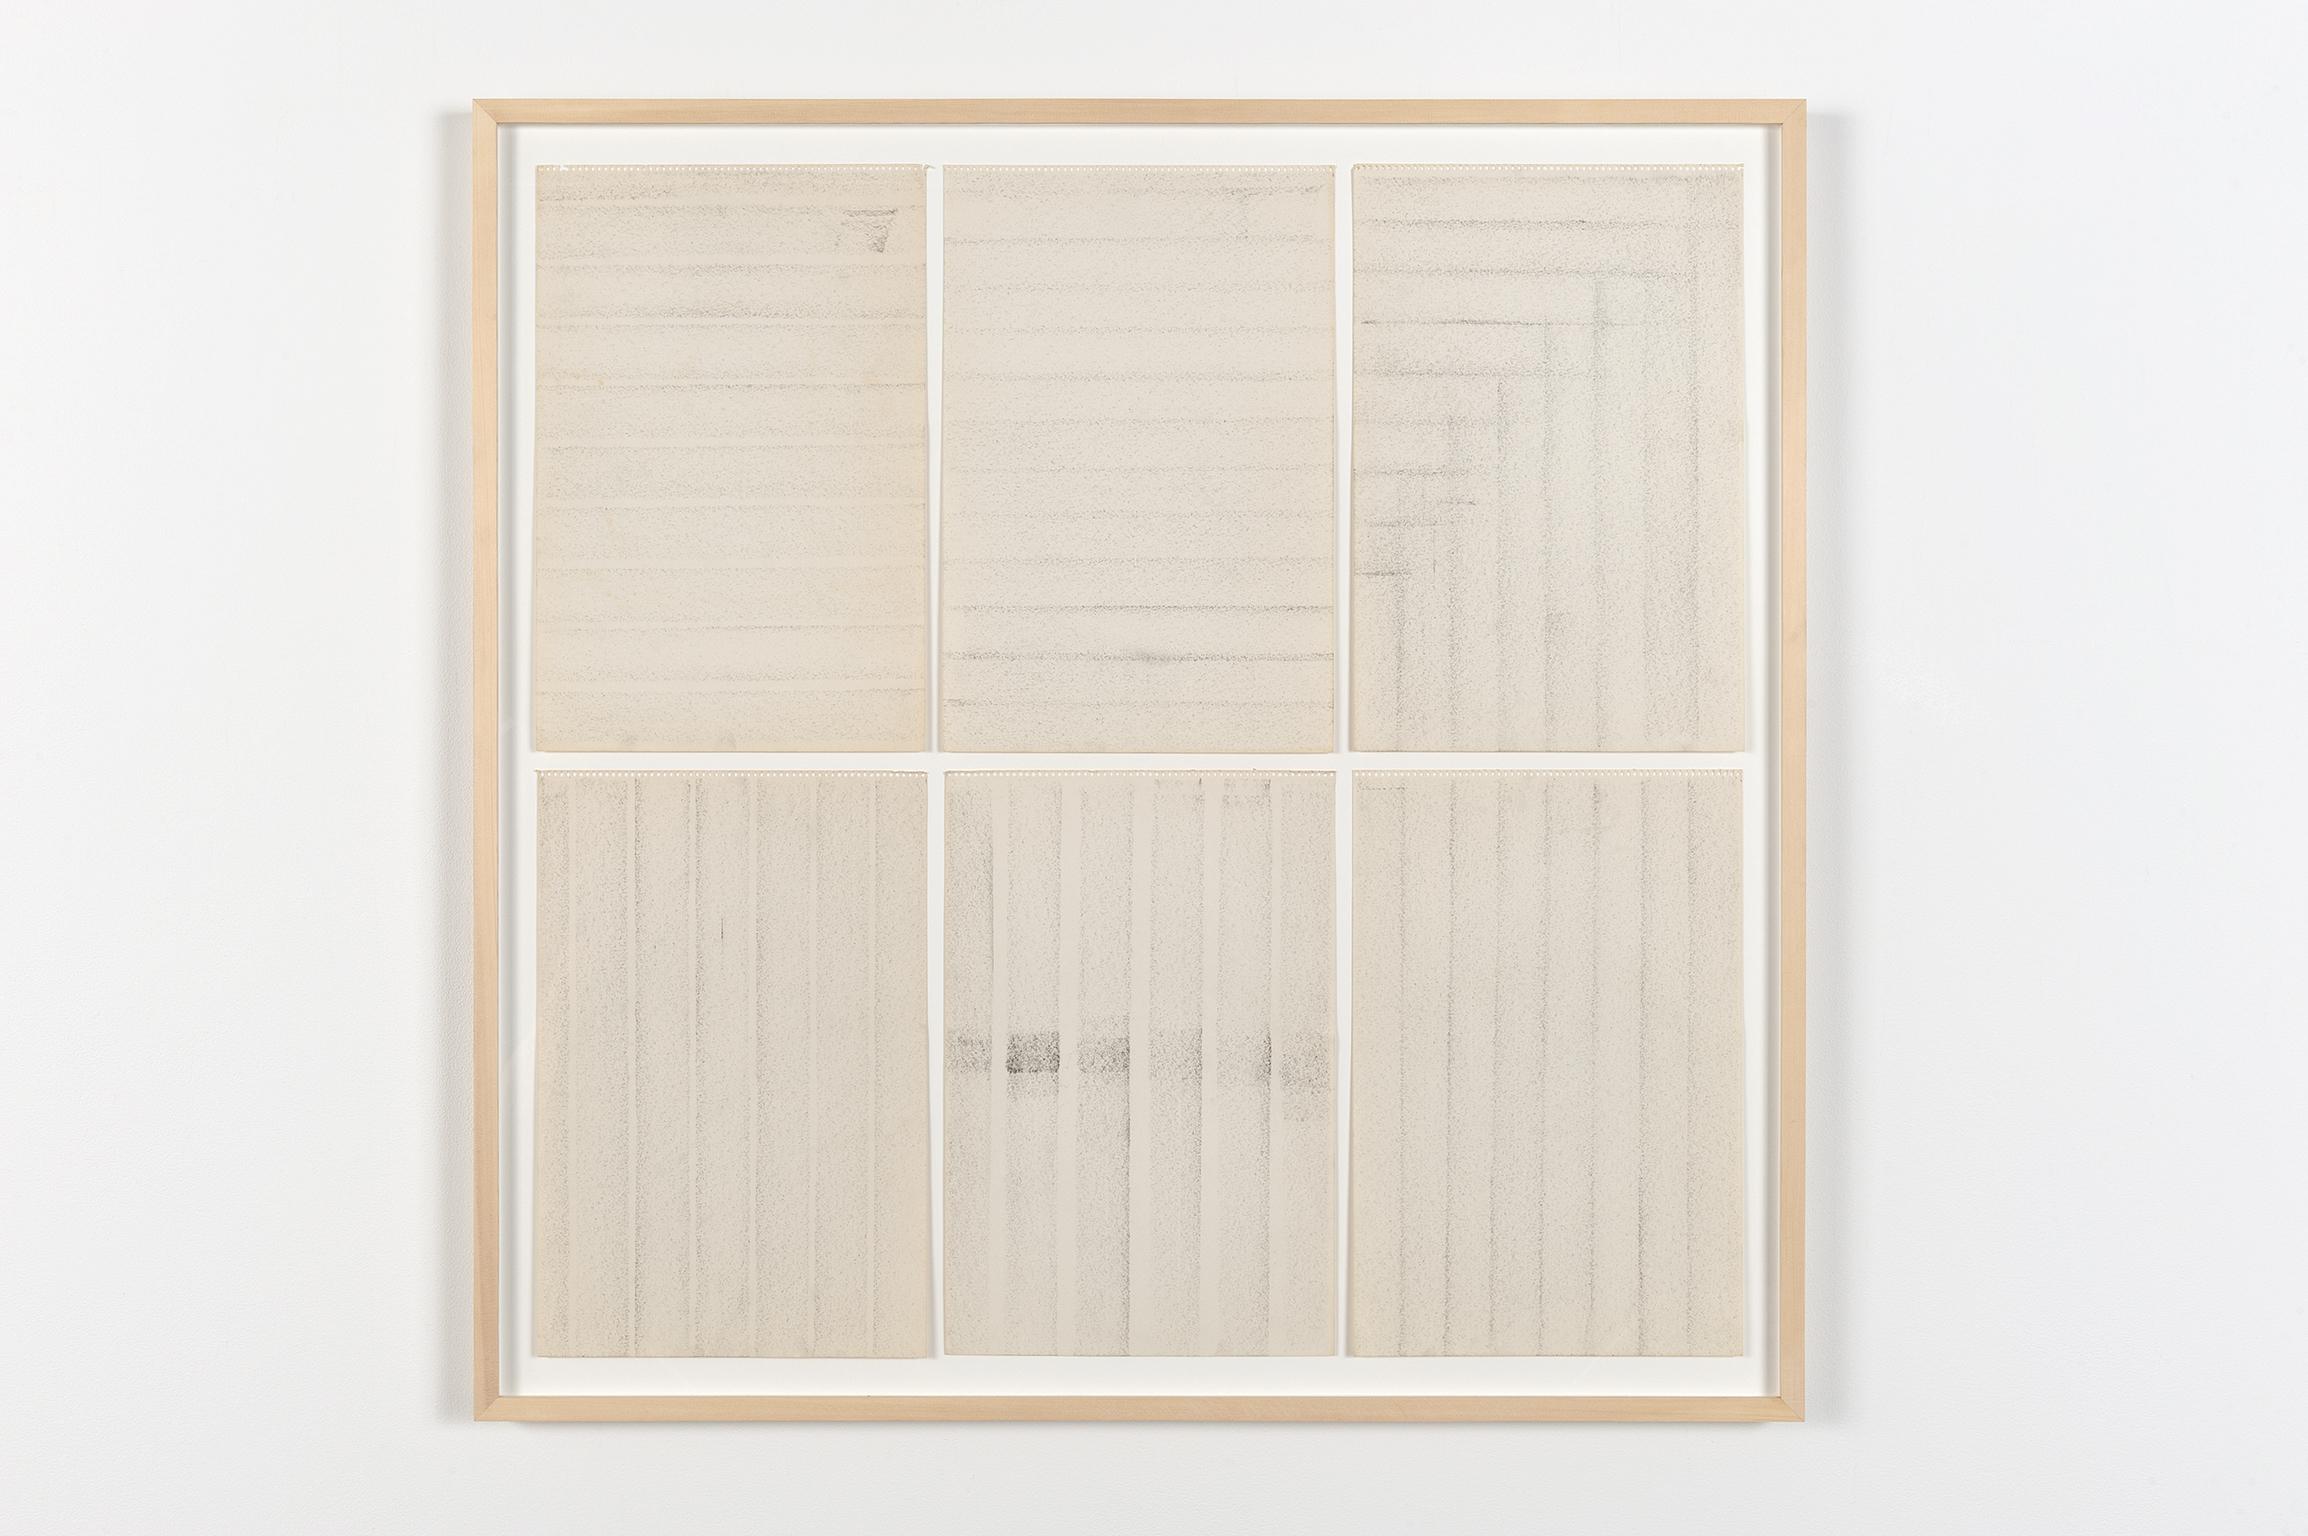 Robert Kleyn, Untitled, 1963–1970, graphite on paper, 40 x 41 in. (102 x 104 cm)   by